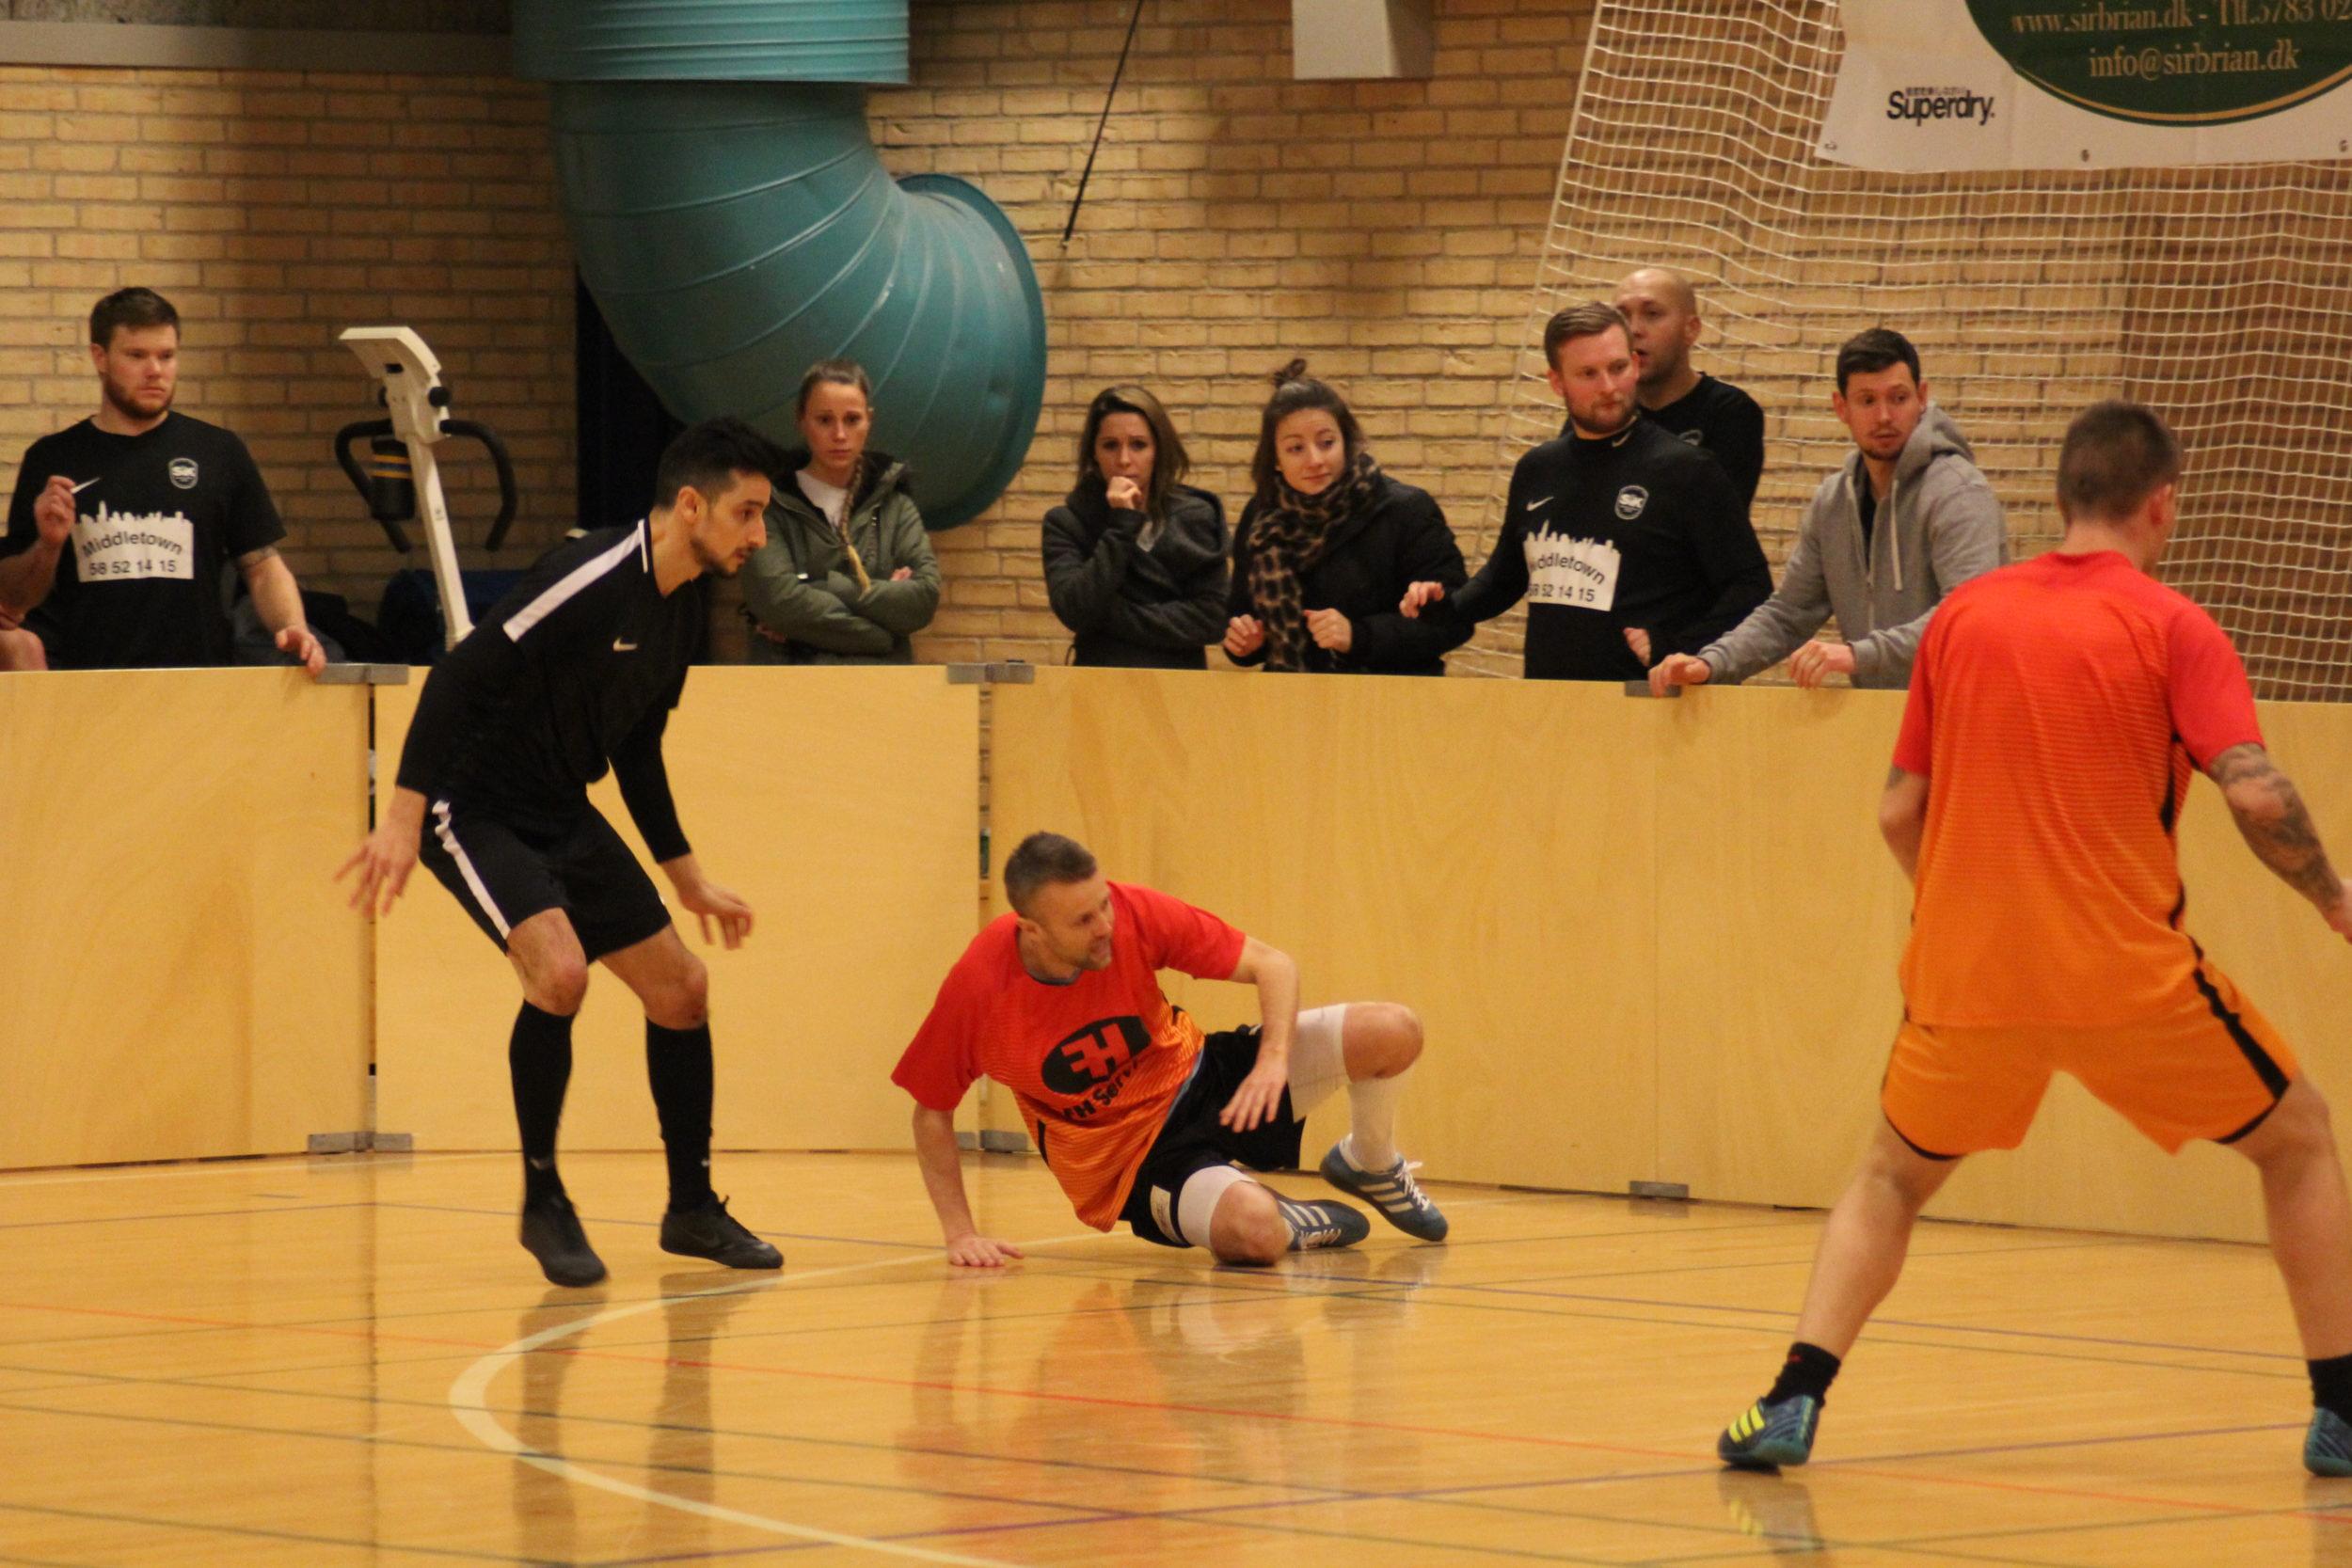 Pressefoto Sørby Fodbold